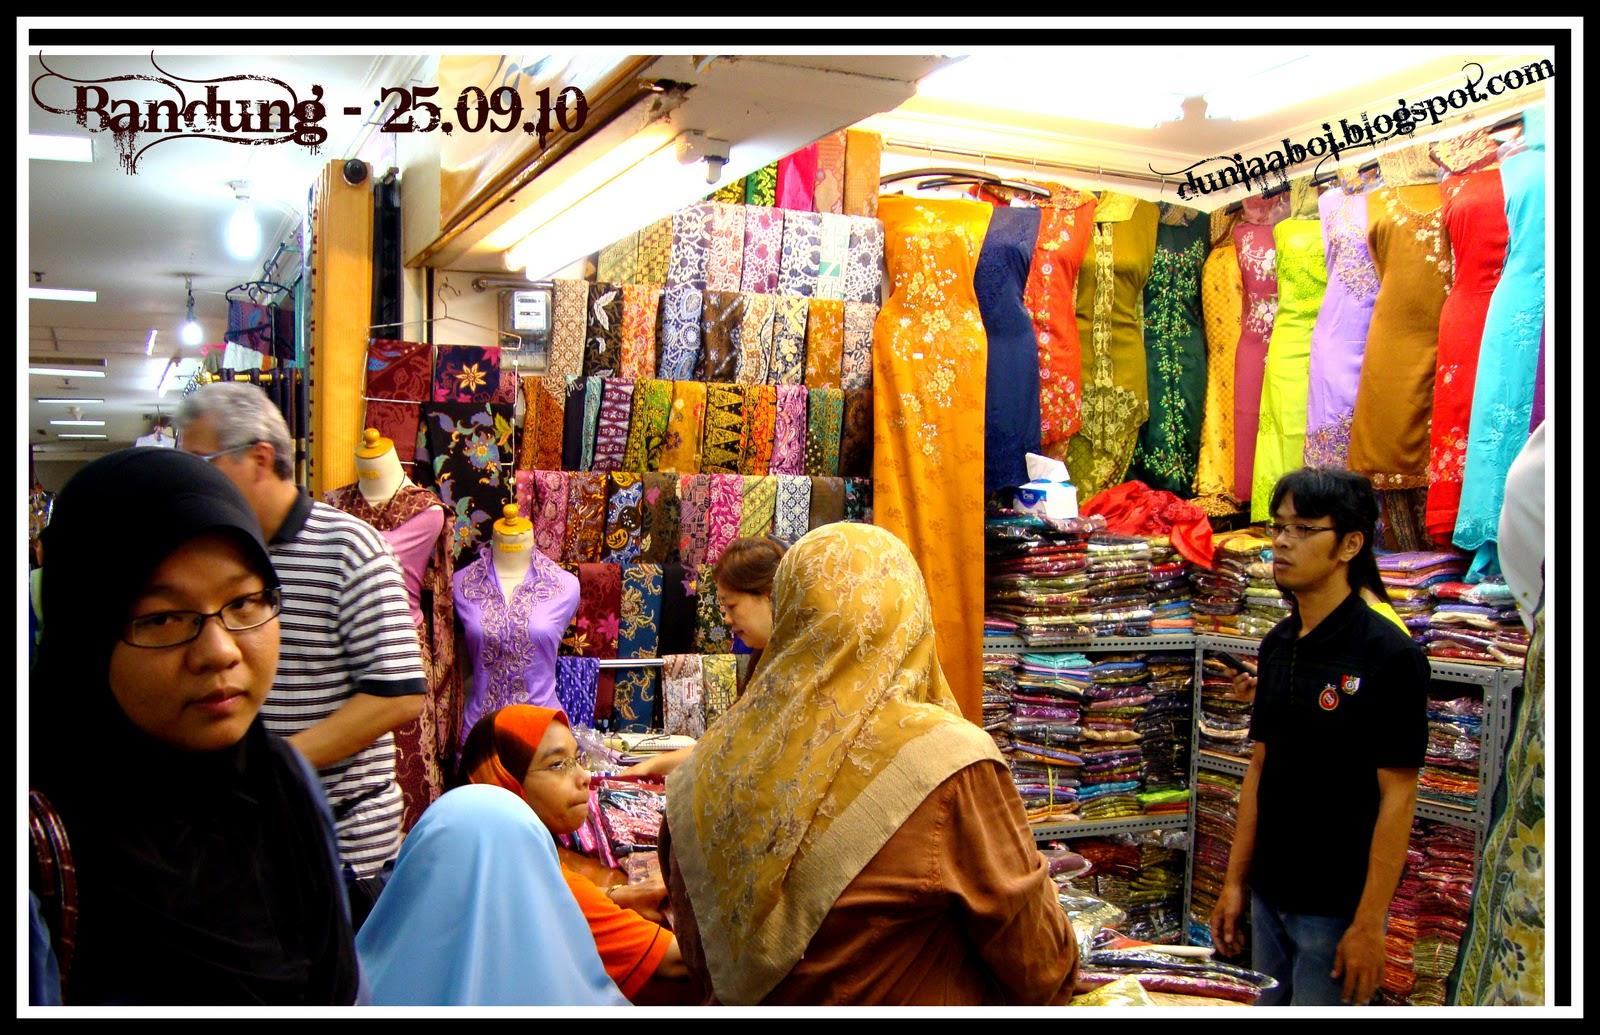 Baju muslim murah pasar klewer kata kata sms Baju gamis pasar baru bandung